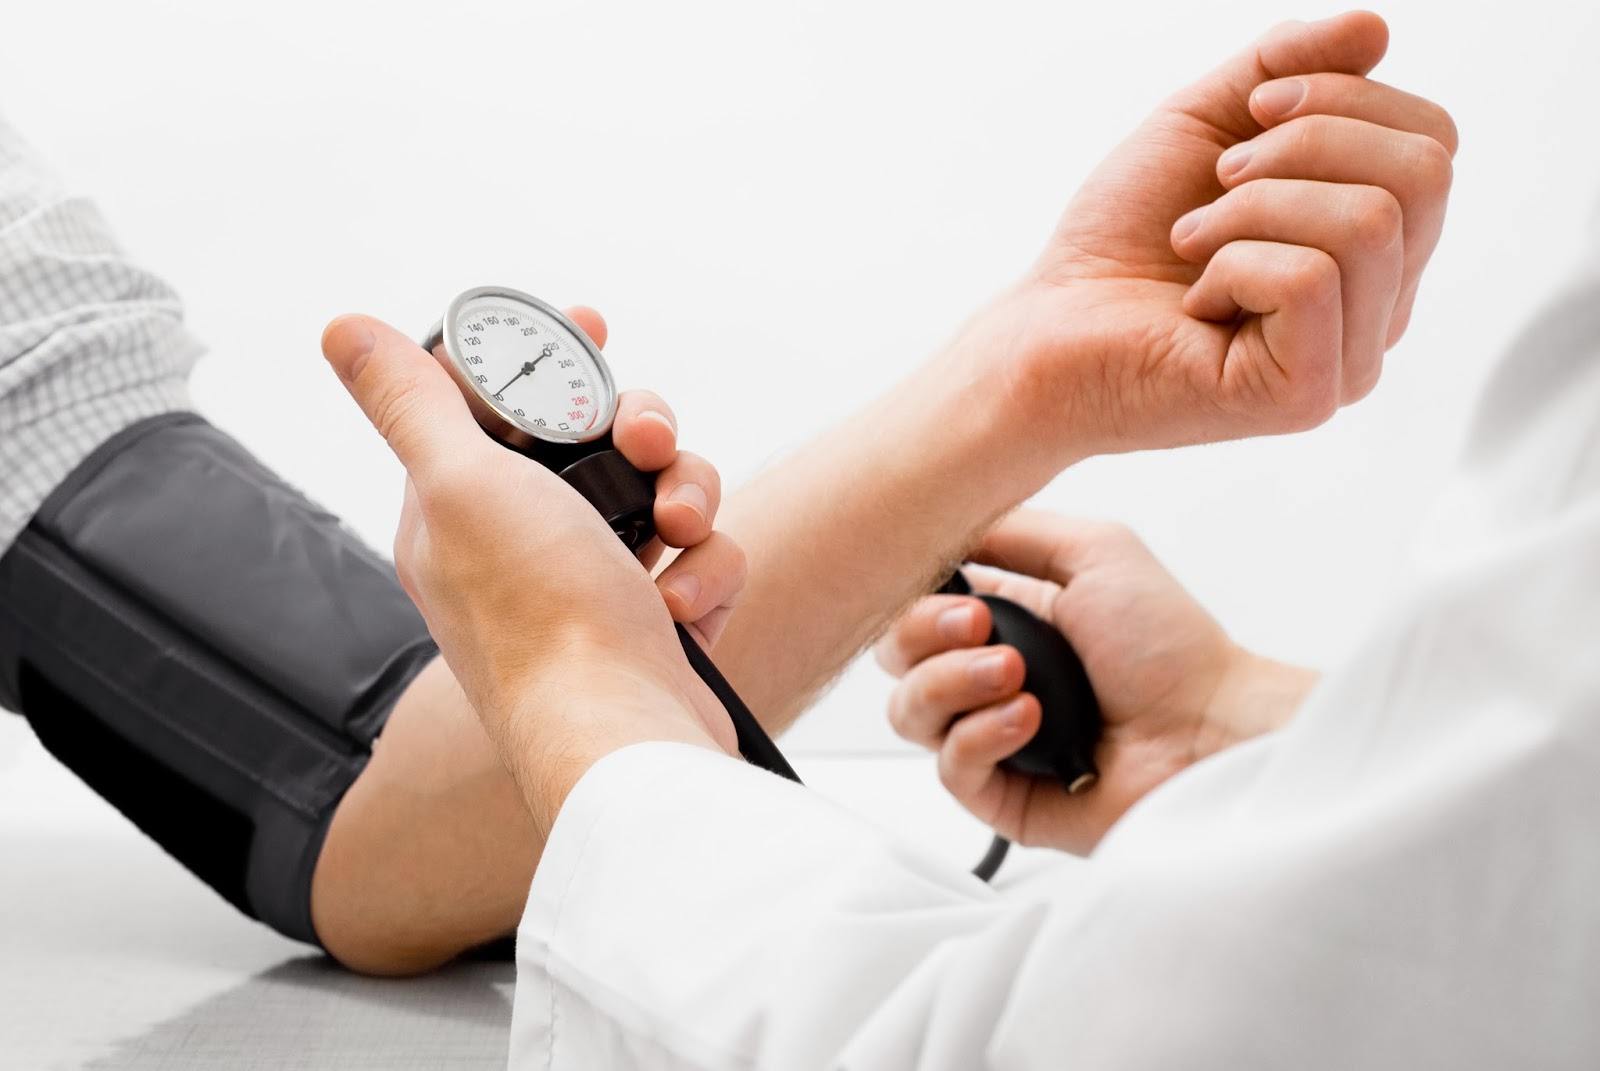 المرتفع والنظام الغذائي المخصص blood pressure allotted 165839_0a464.jpg